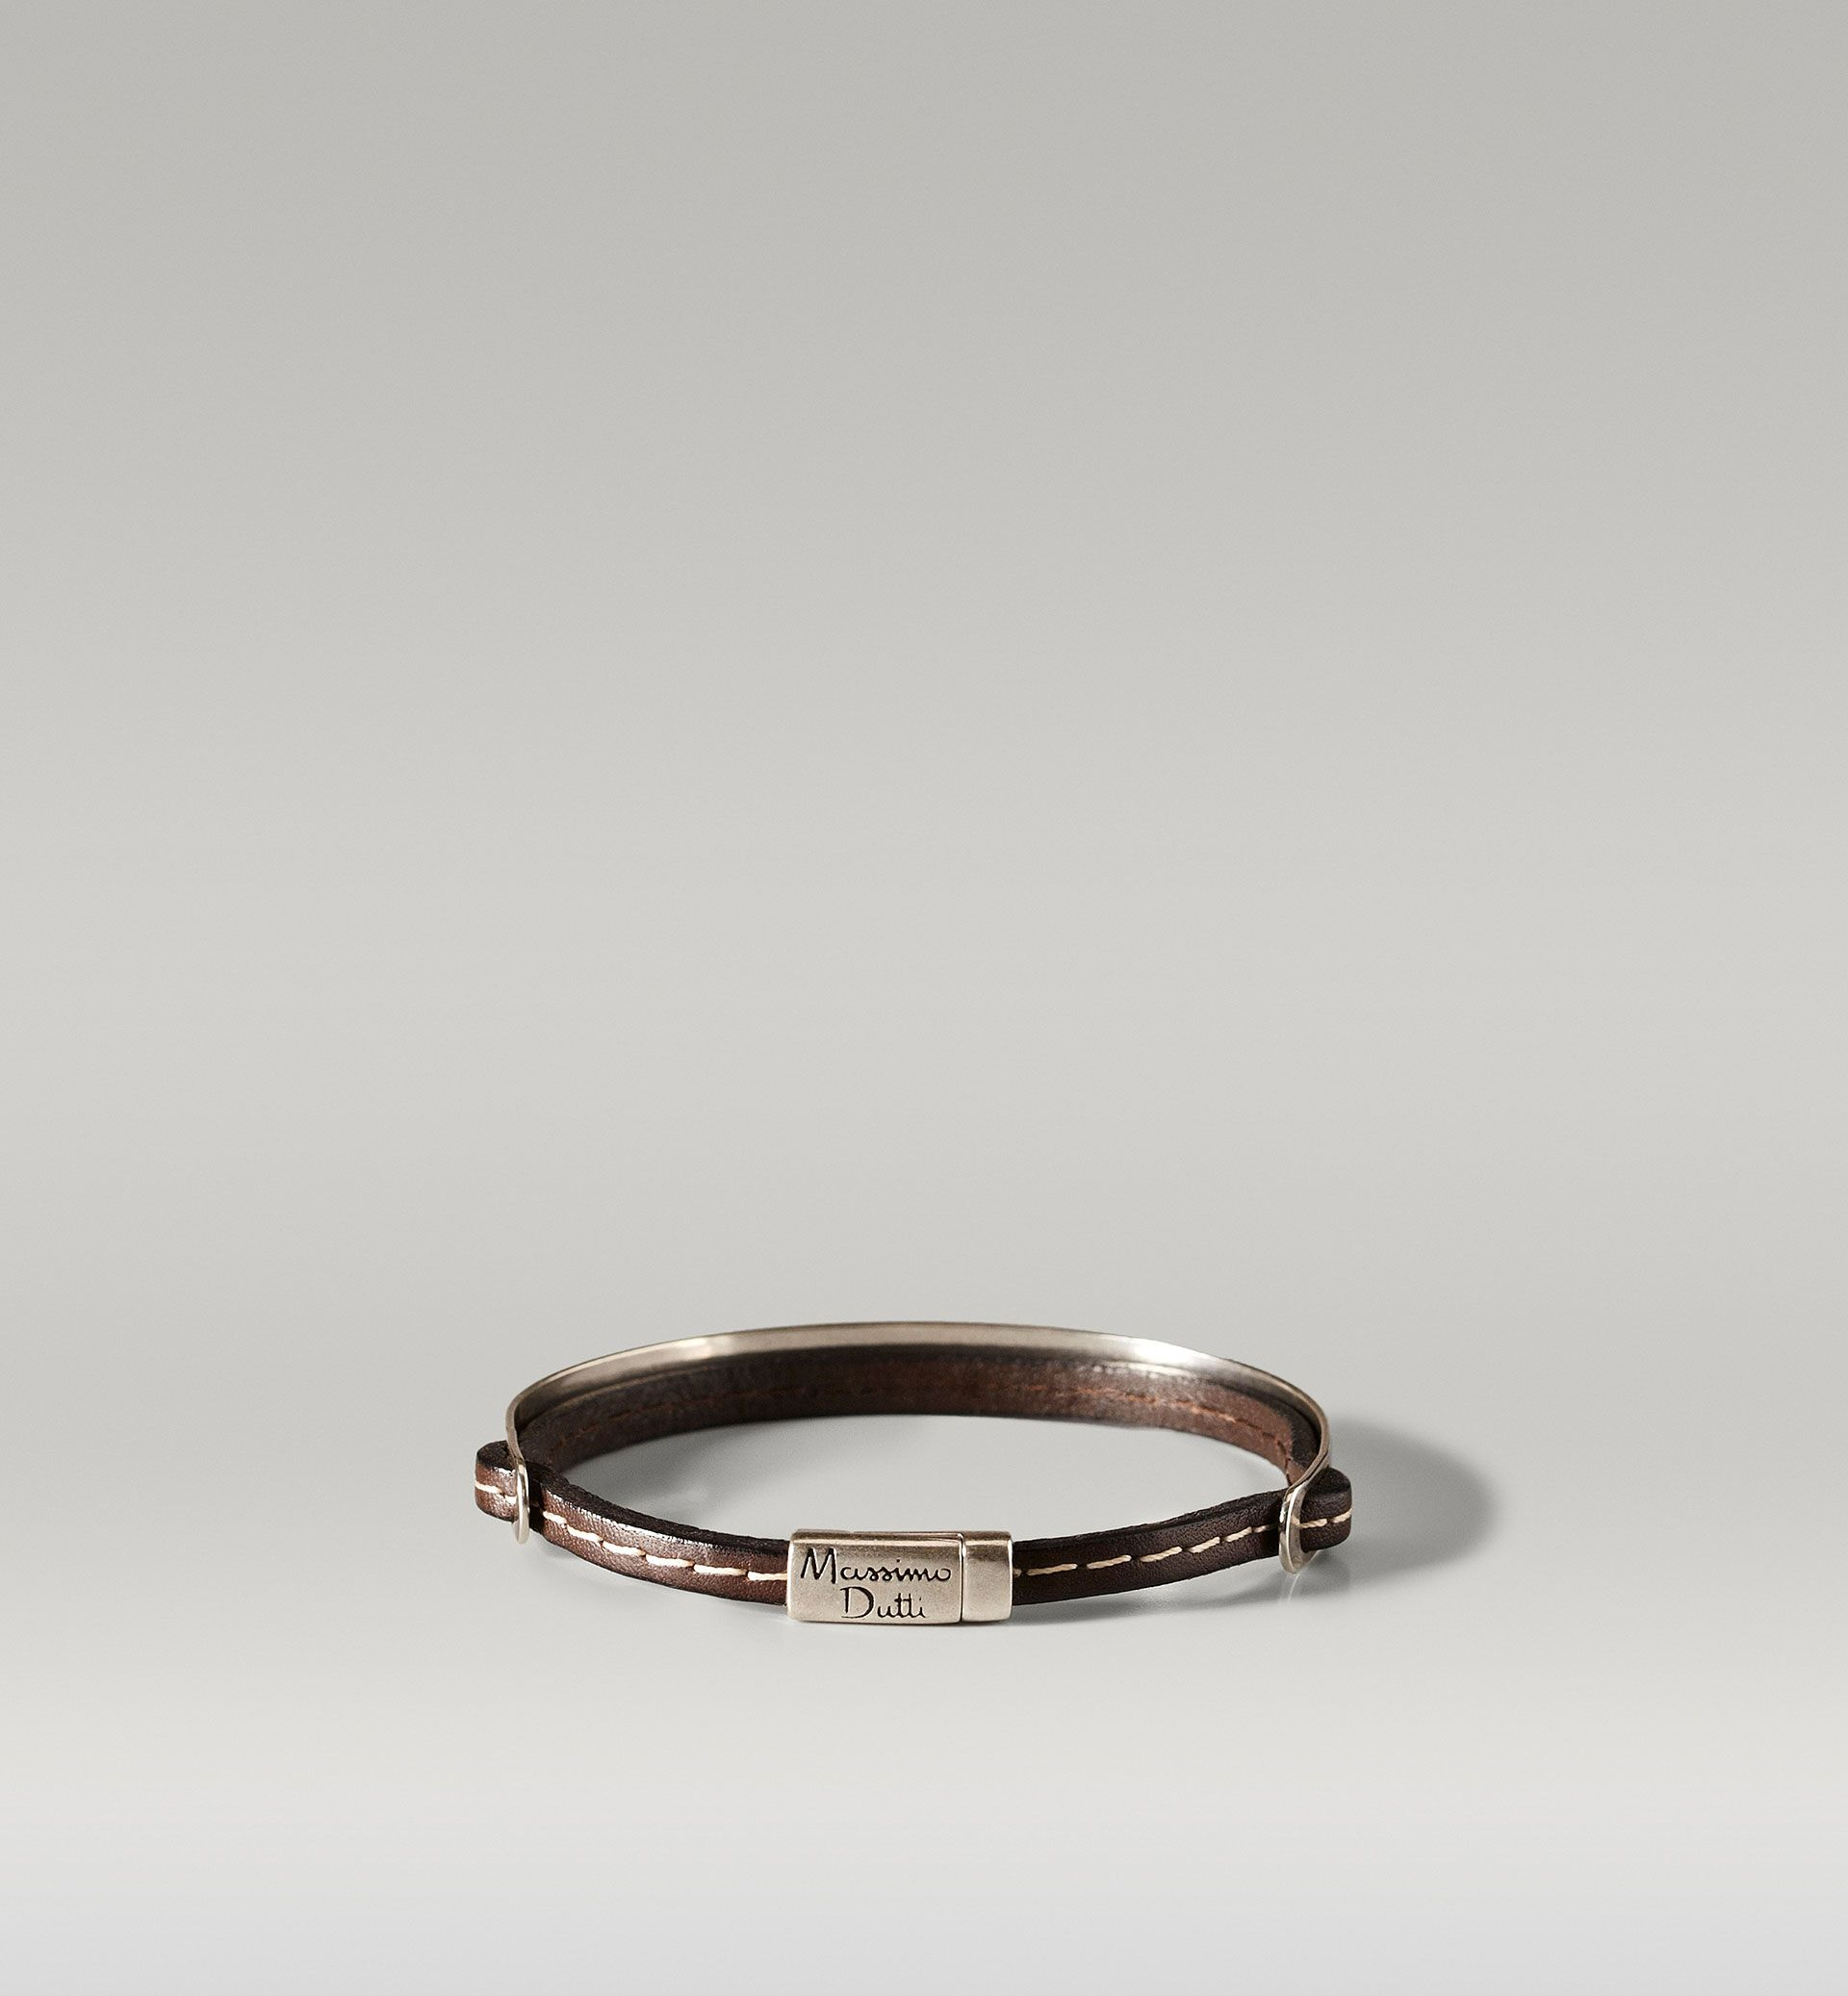 95b991e4f2fd1 METAL PLAQUE BRACELET   Massimo Dutti   Style   Man   Bracelets ...